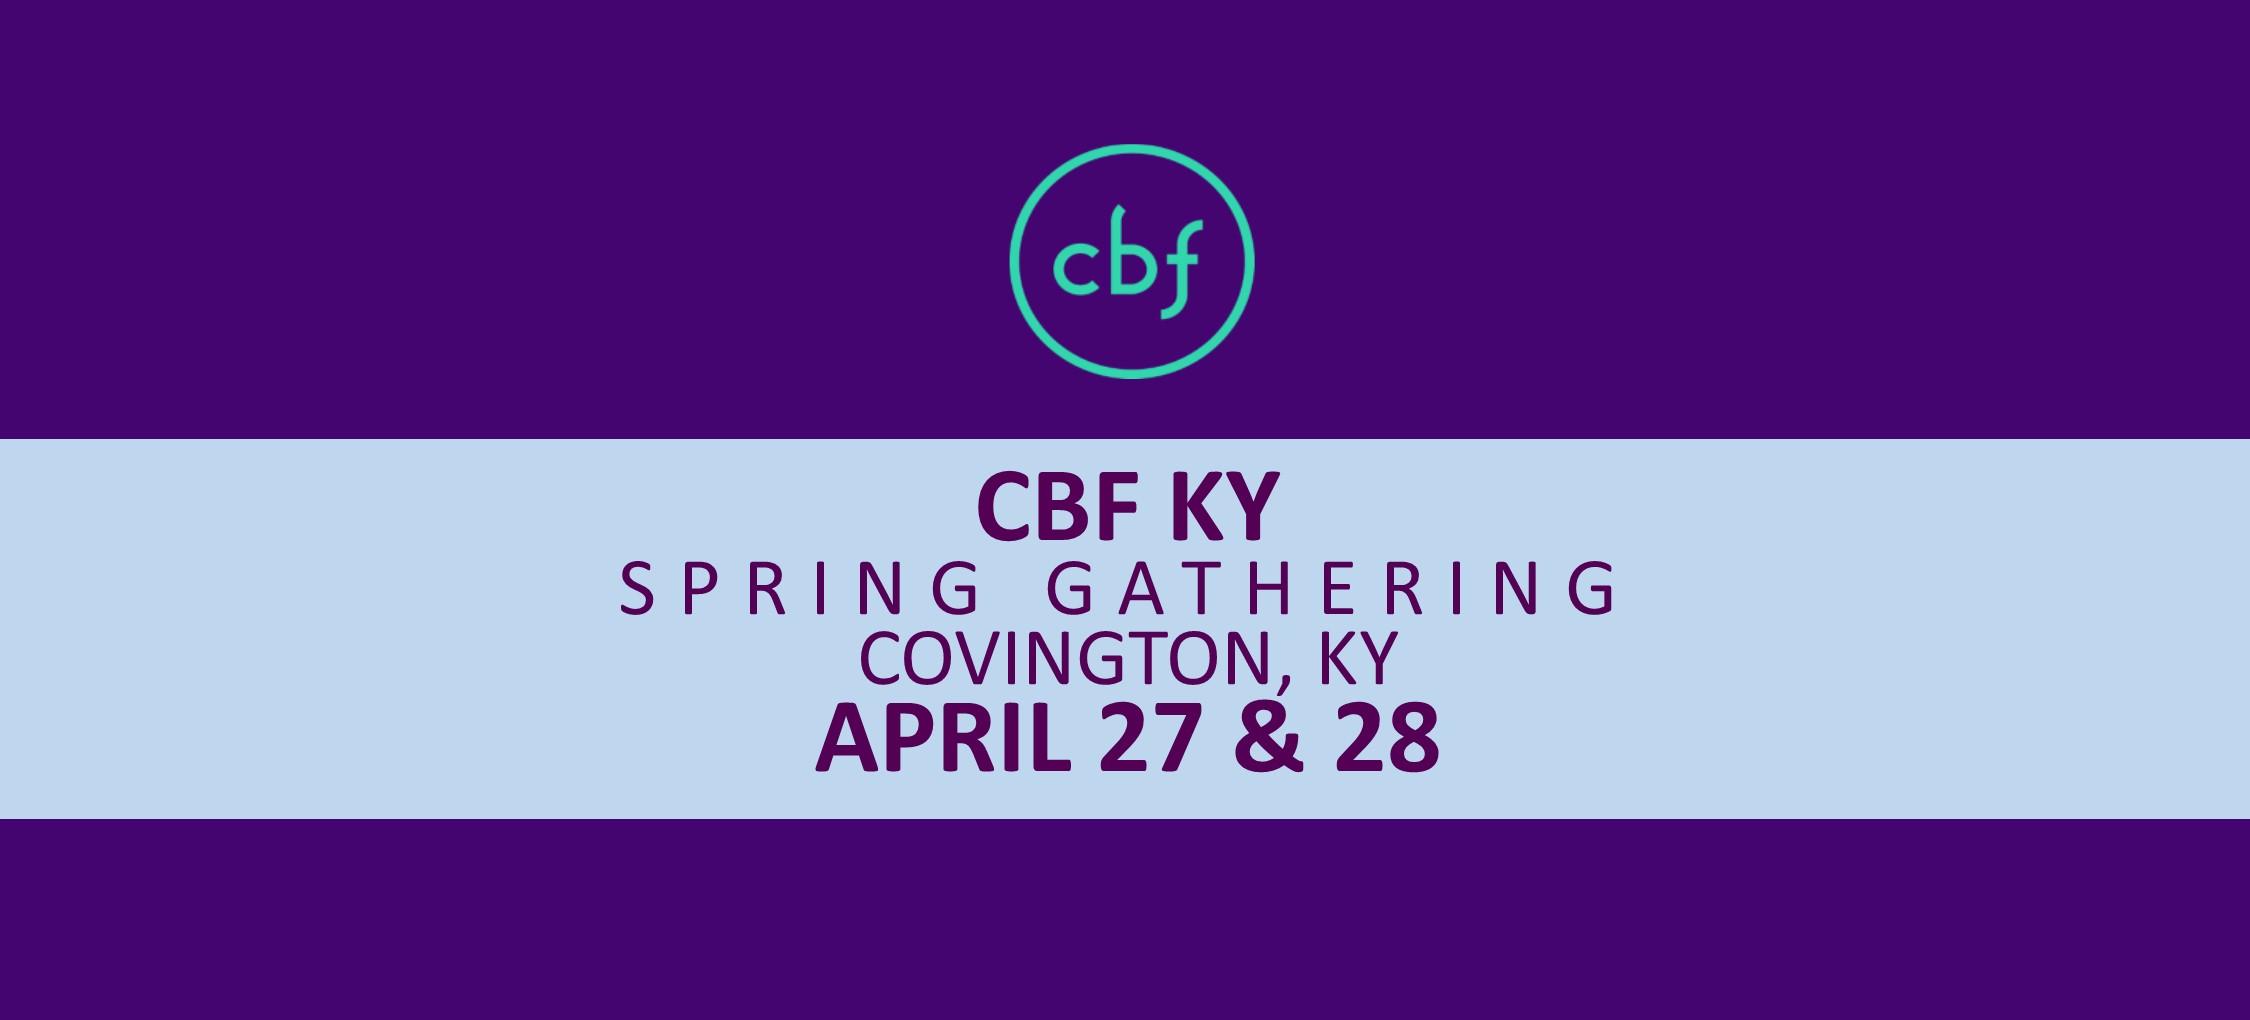 CBF Spring Gathering  WP 032919.jpg